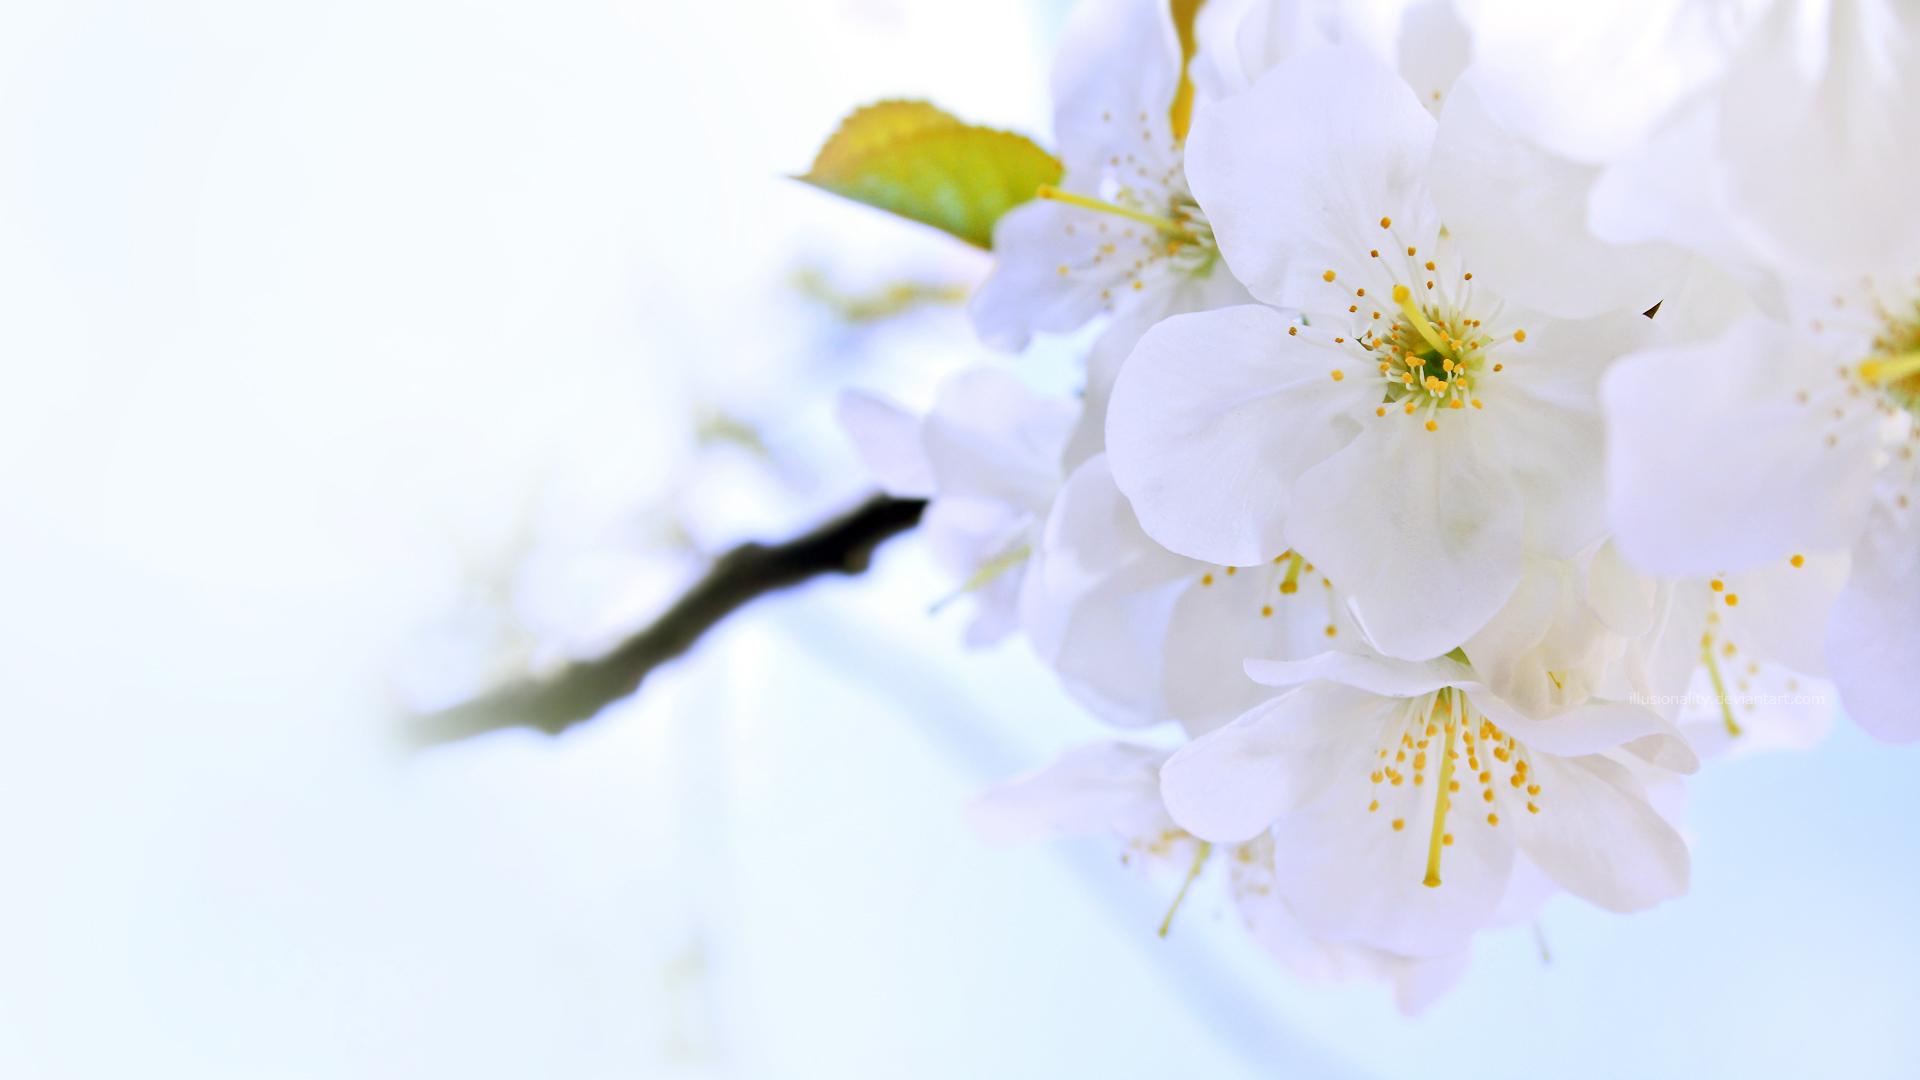 Flower Summer Bright - Flower Summer Bright